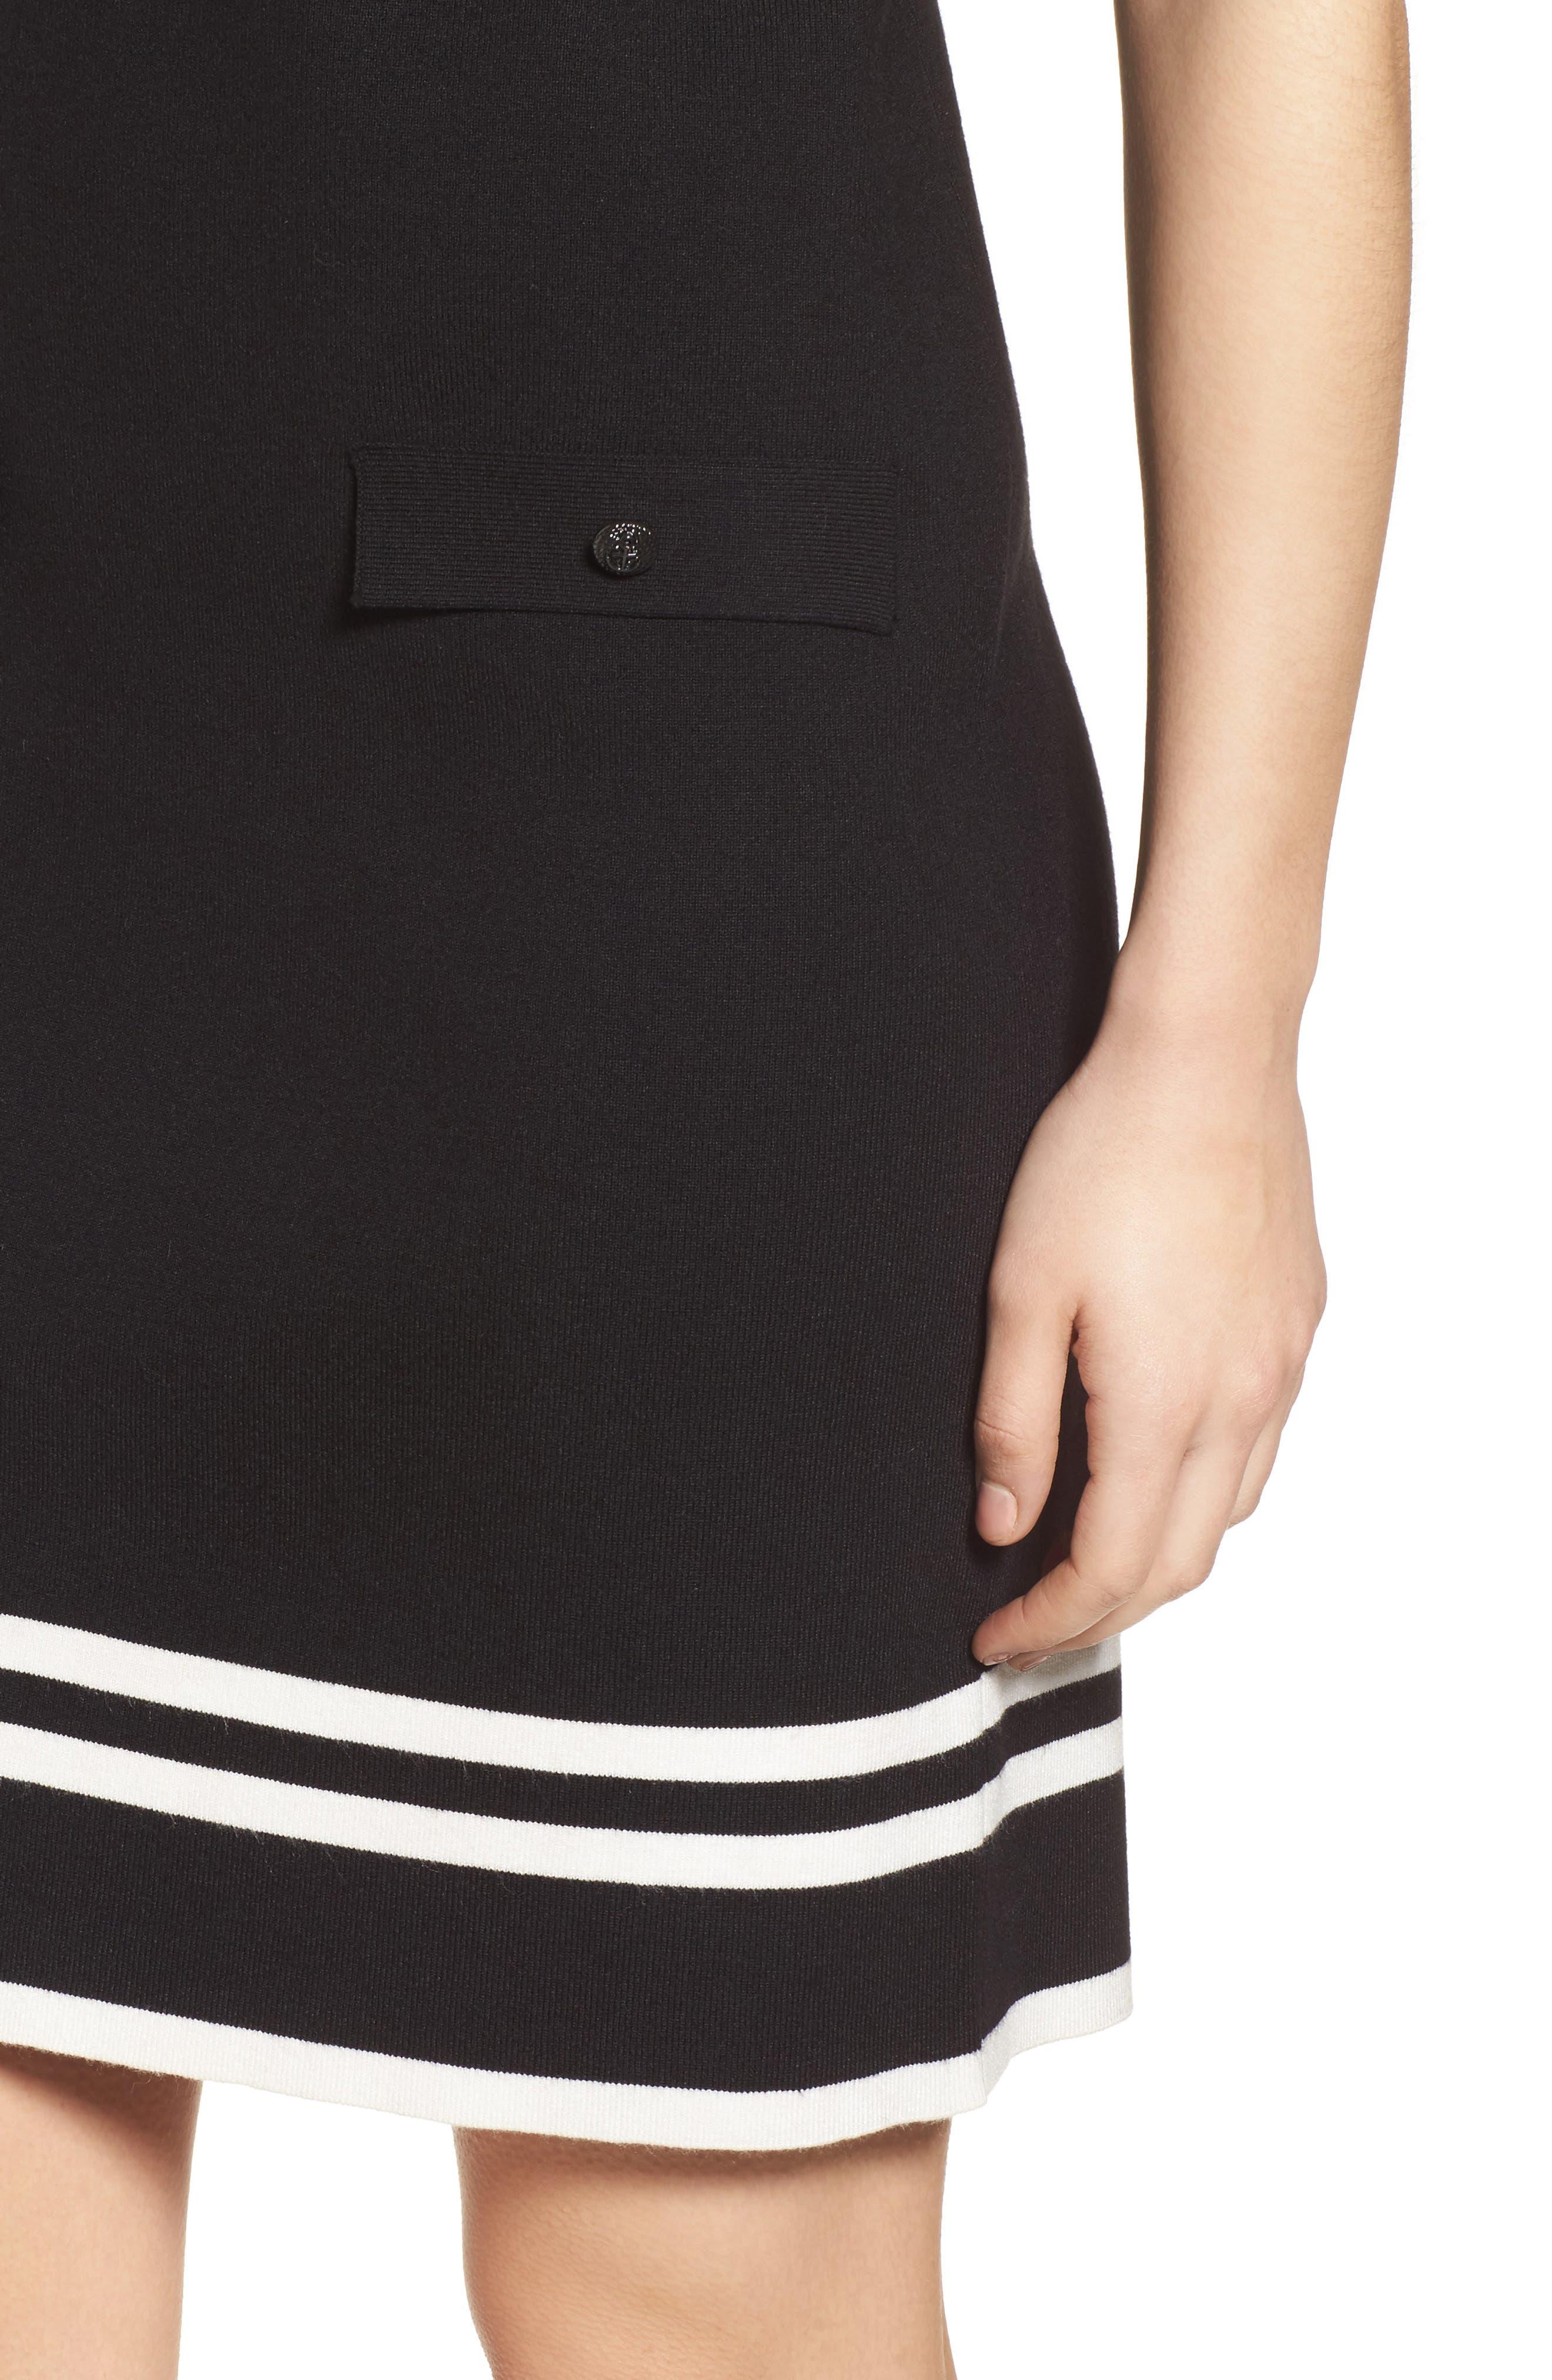 Ann Klein New York Stripe Border Knit Sheath Dress,                             Alternate thumbnail 4, color,                             Black/ White